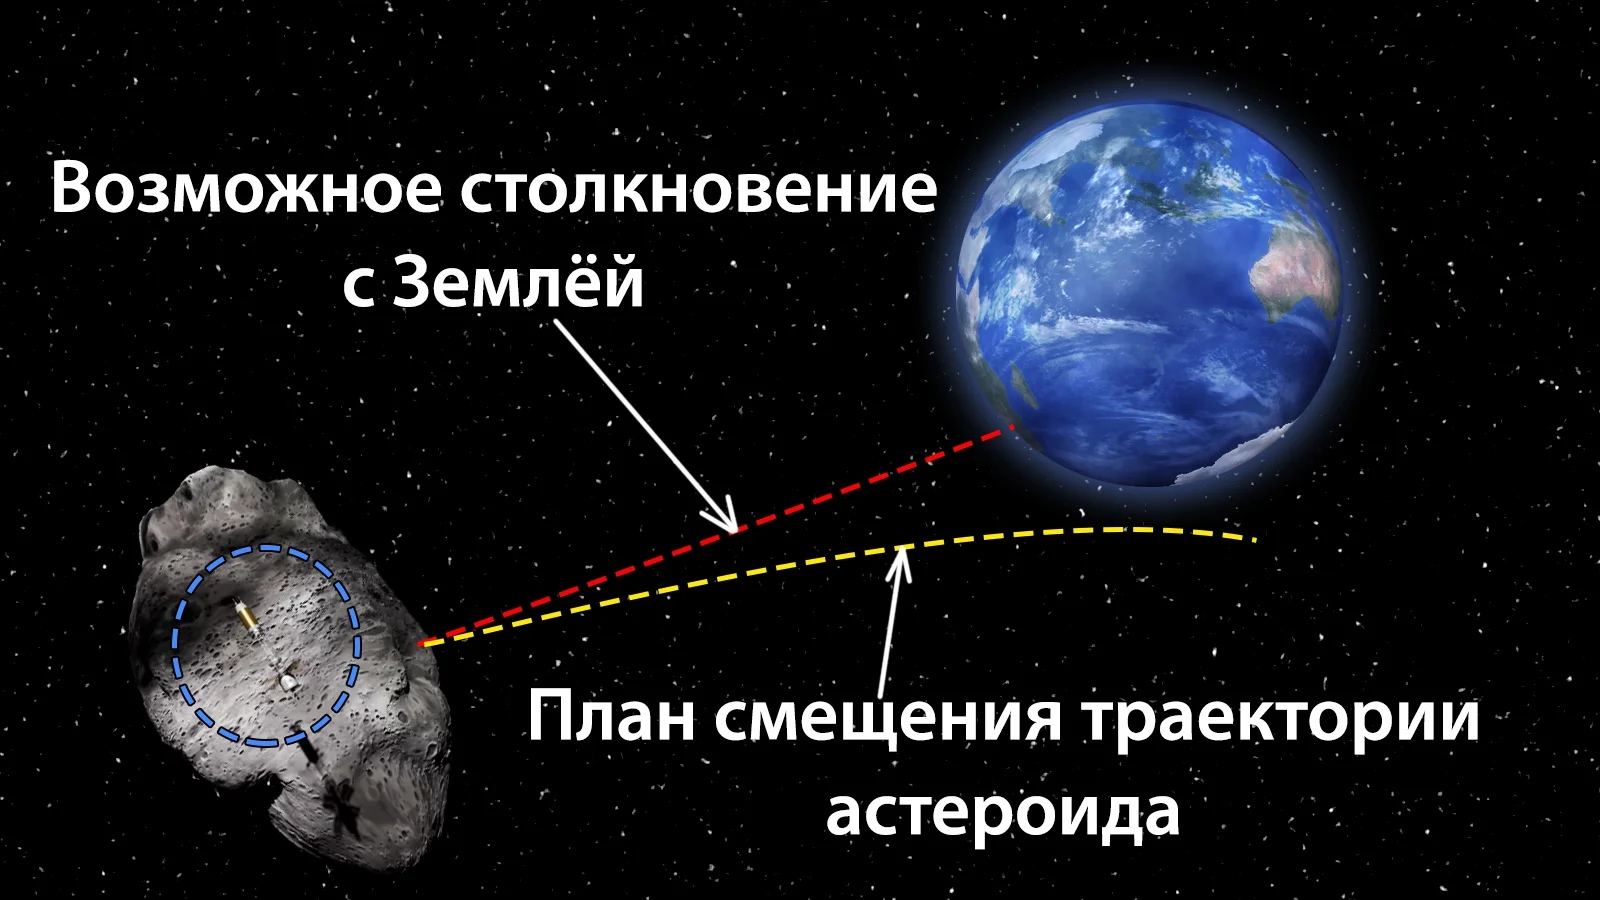 смещение траектории астероида